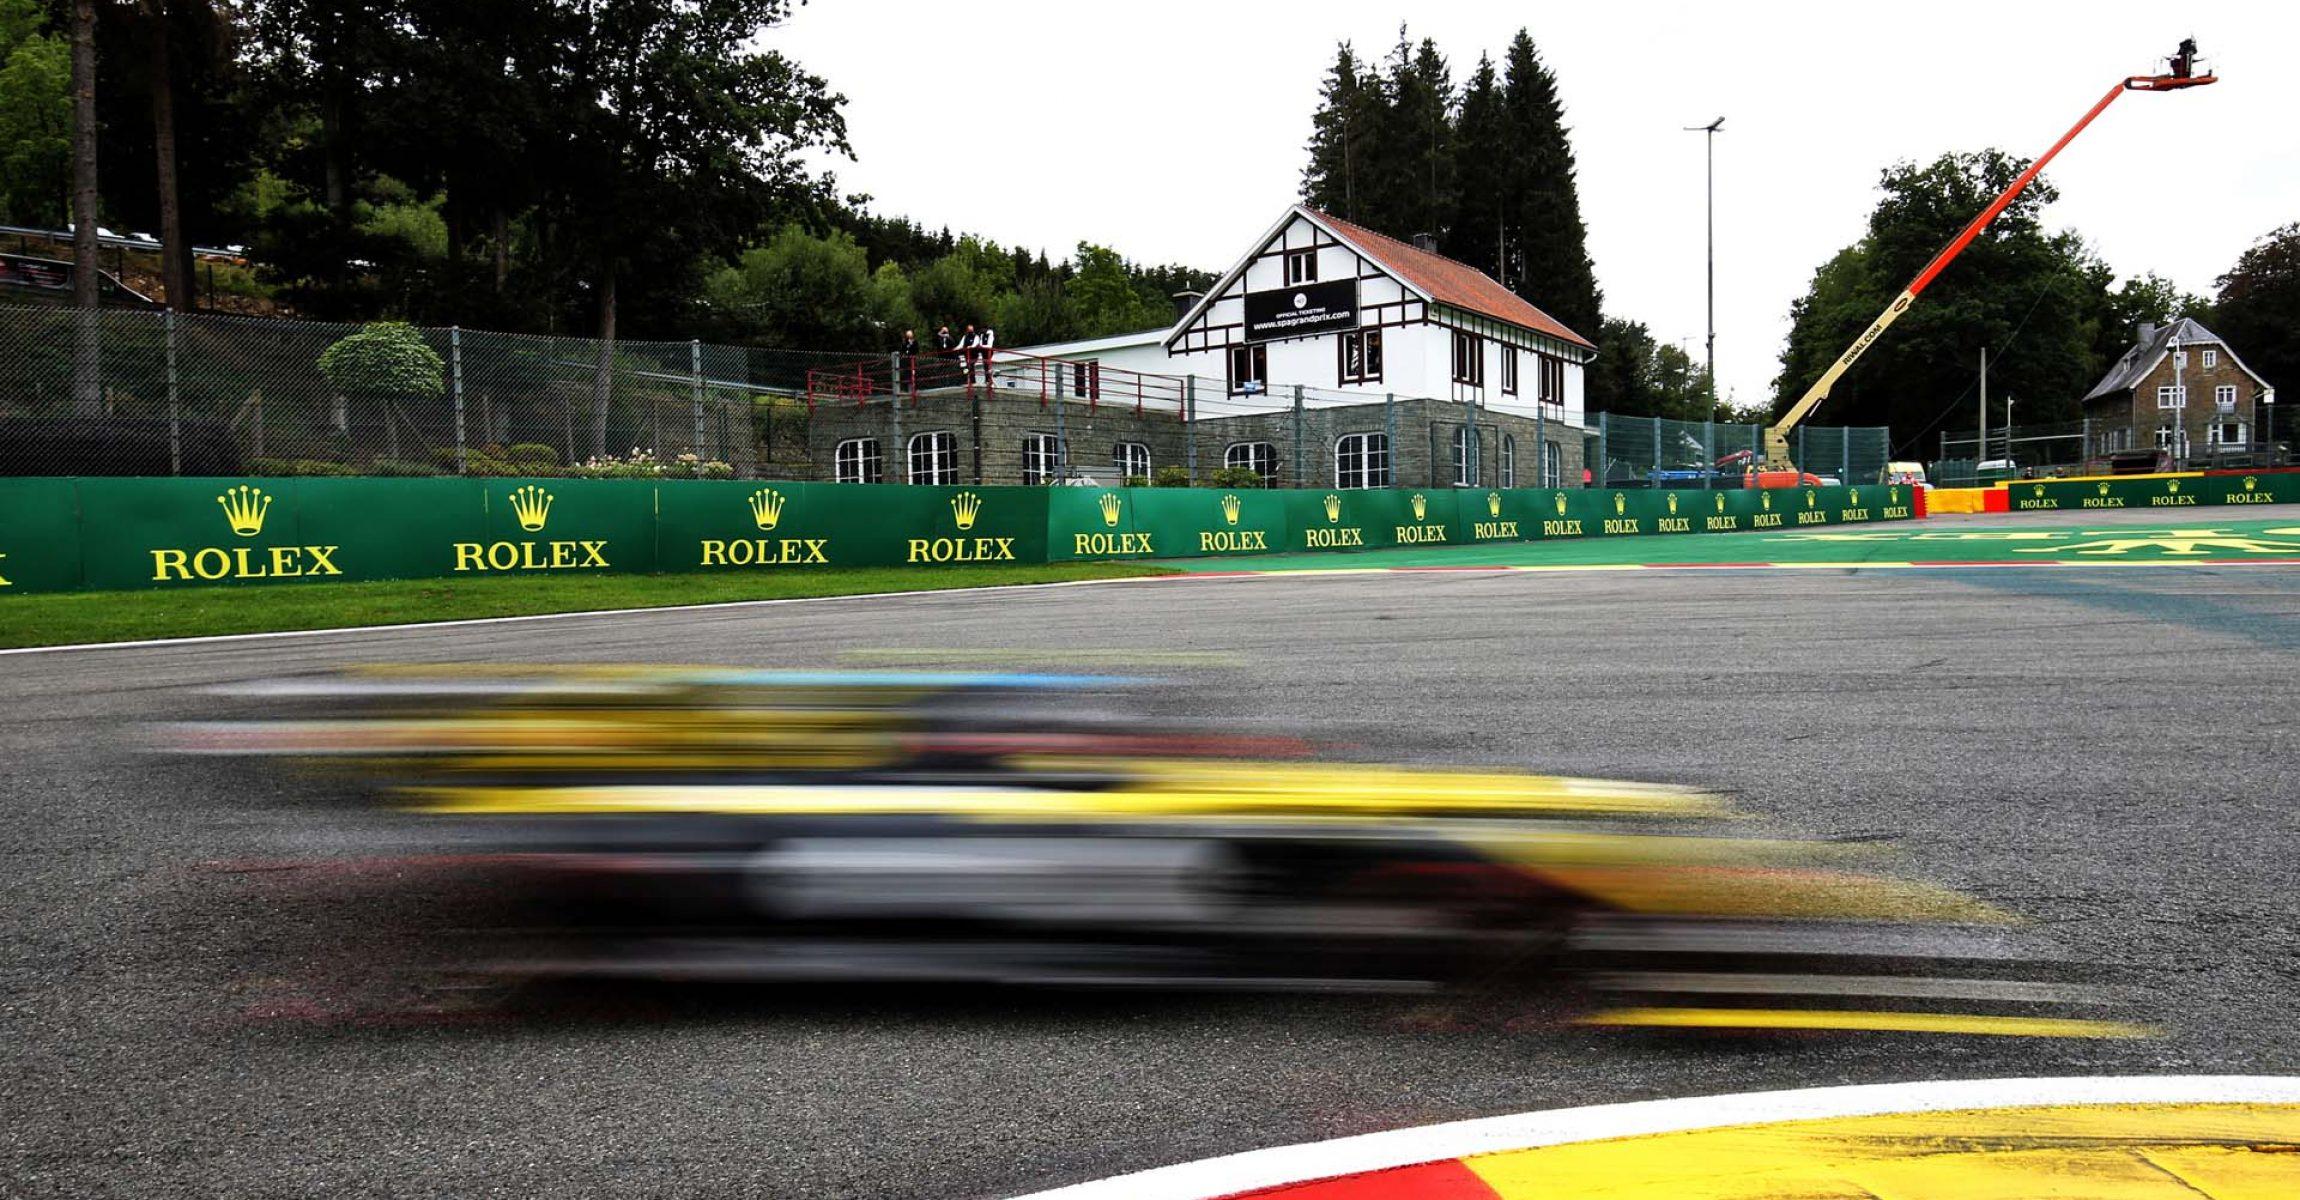 Esteban Ocon (FRA) Renault F1 Team RS20. Belgian Grand Prix, Saturday 29th August 2020. Spa-Francorchamps, Belgium.